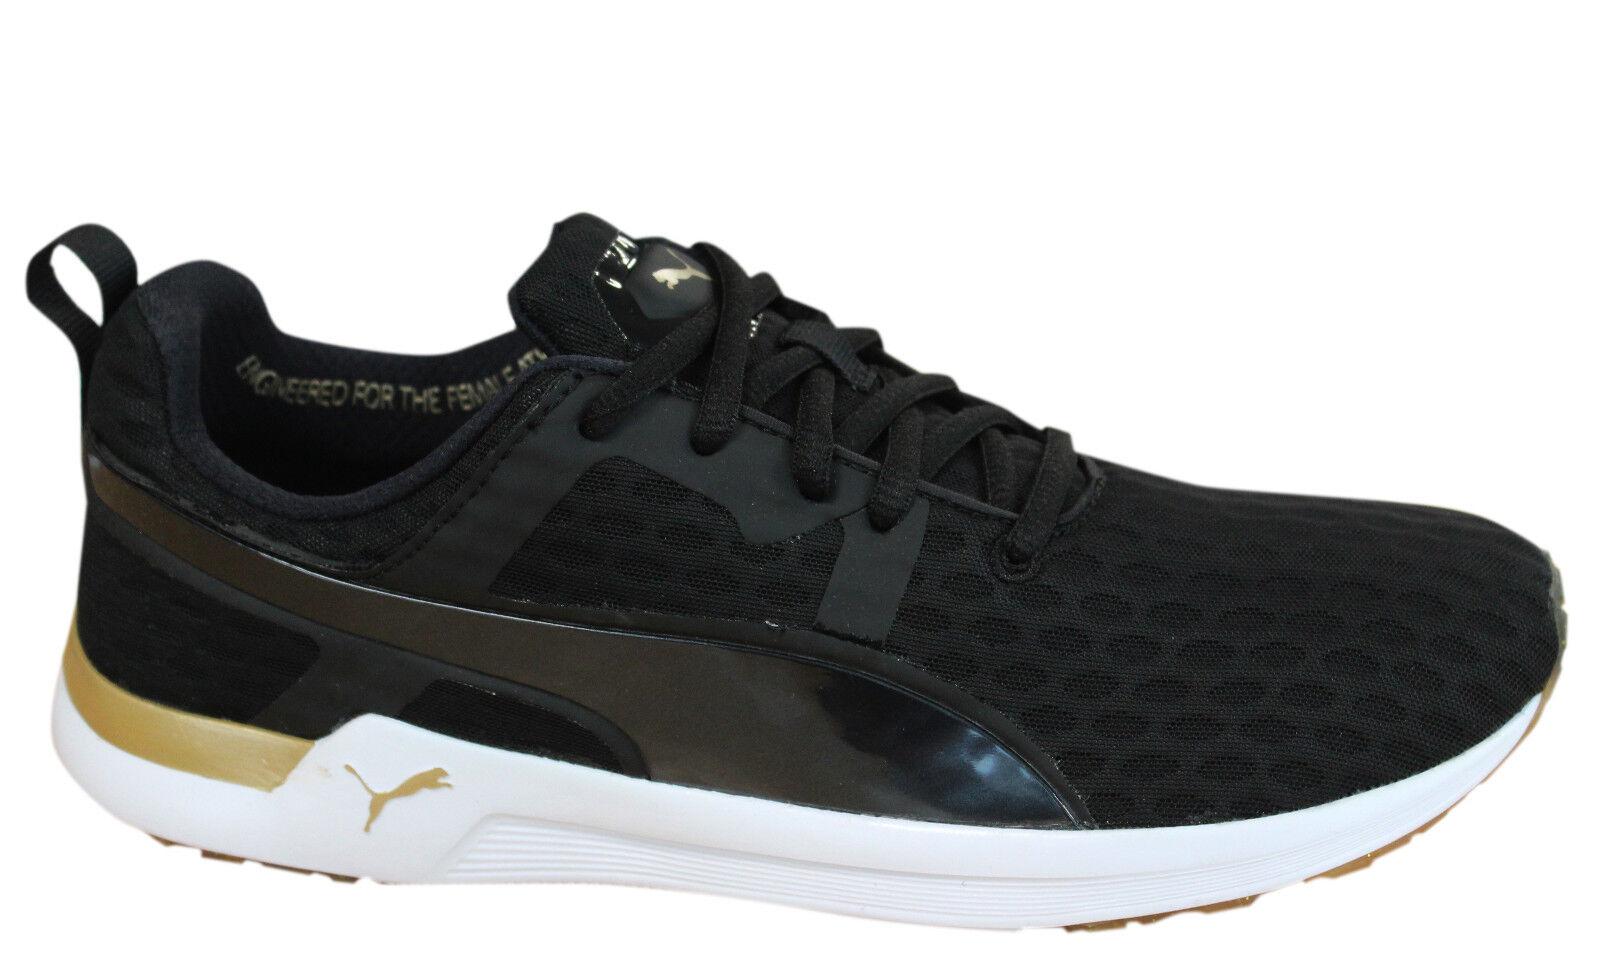 Puma pulso XT v2 Negro Dorado para Mujer Con Cordones Textil Entrenadores 188971 02 D46